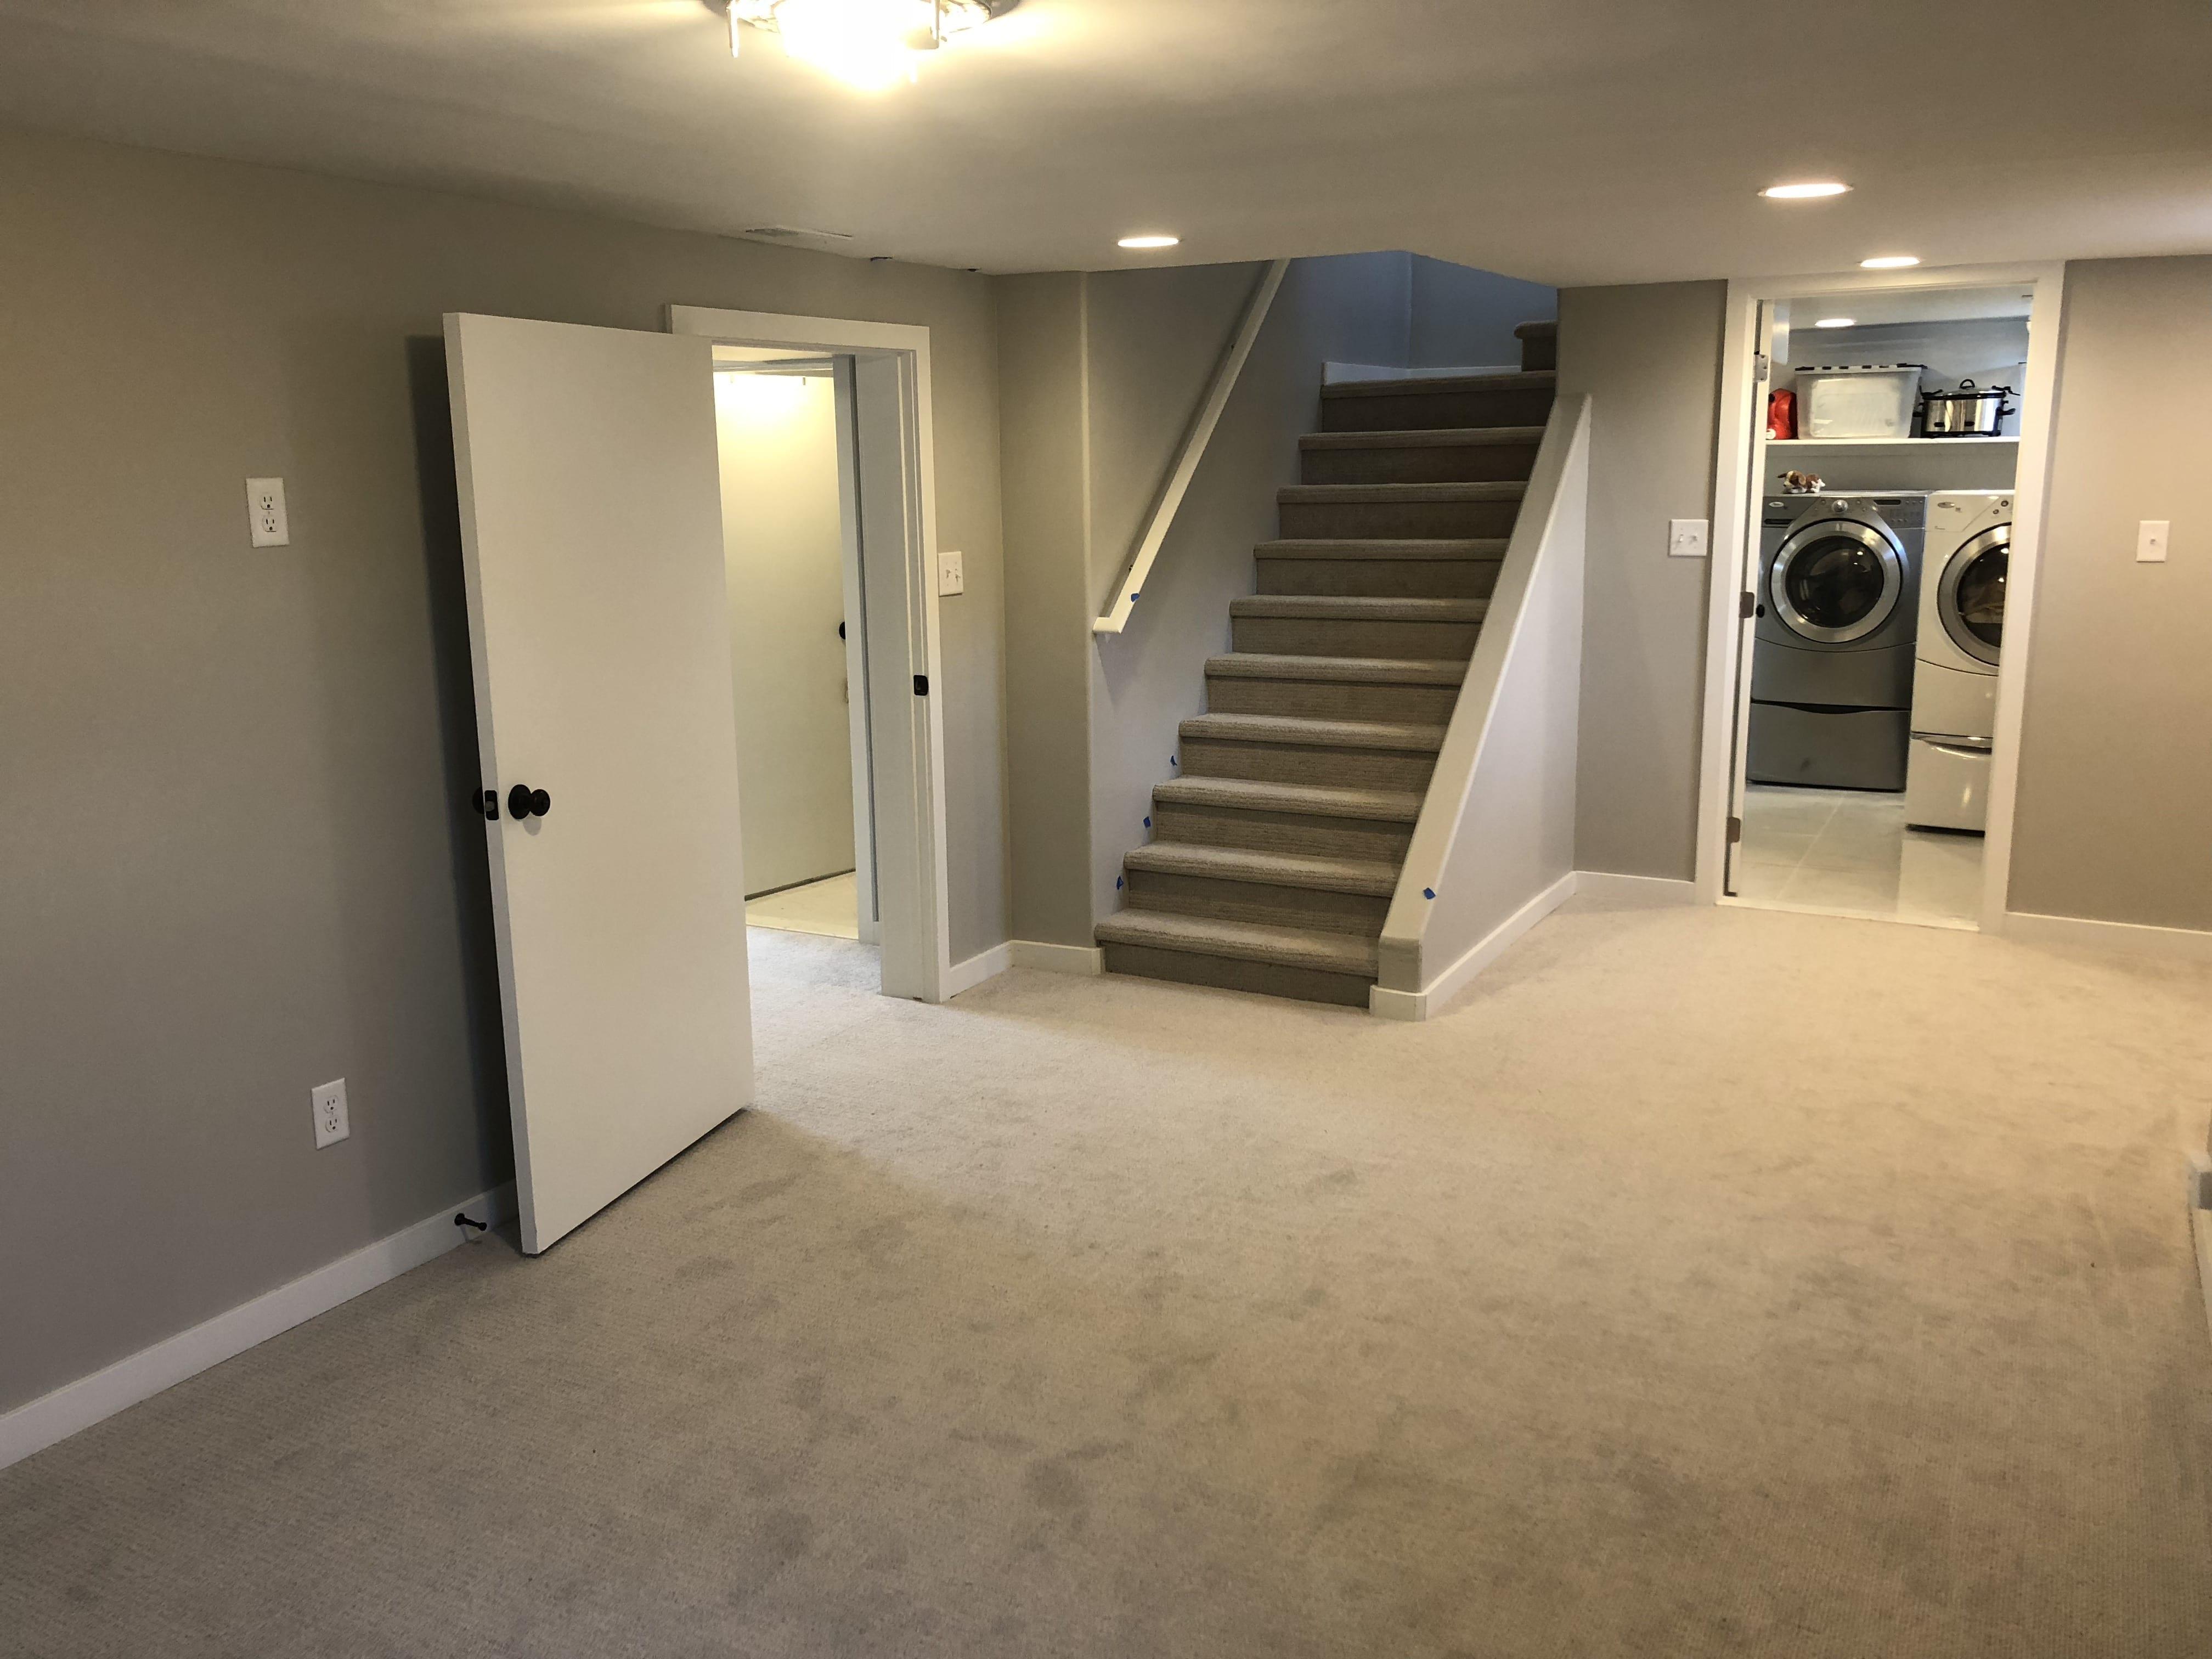 Basement Remodel Guide - Living Room Real Estate